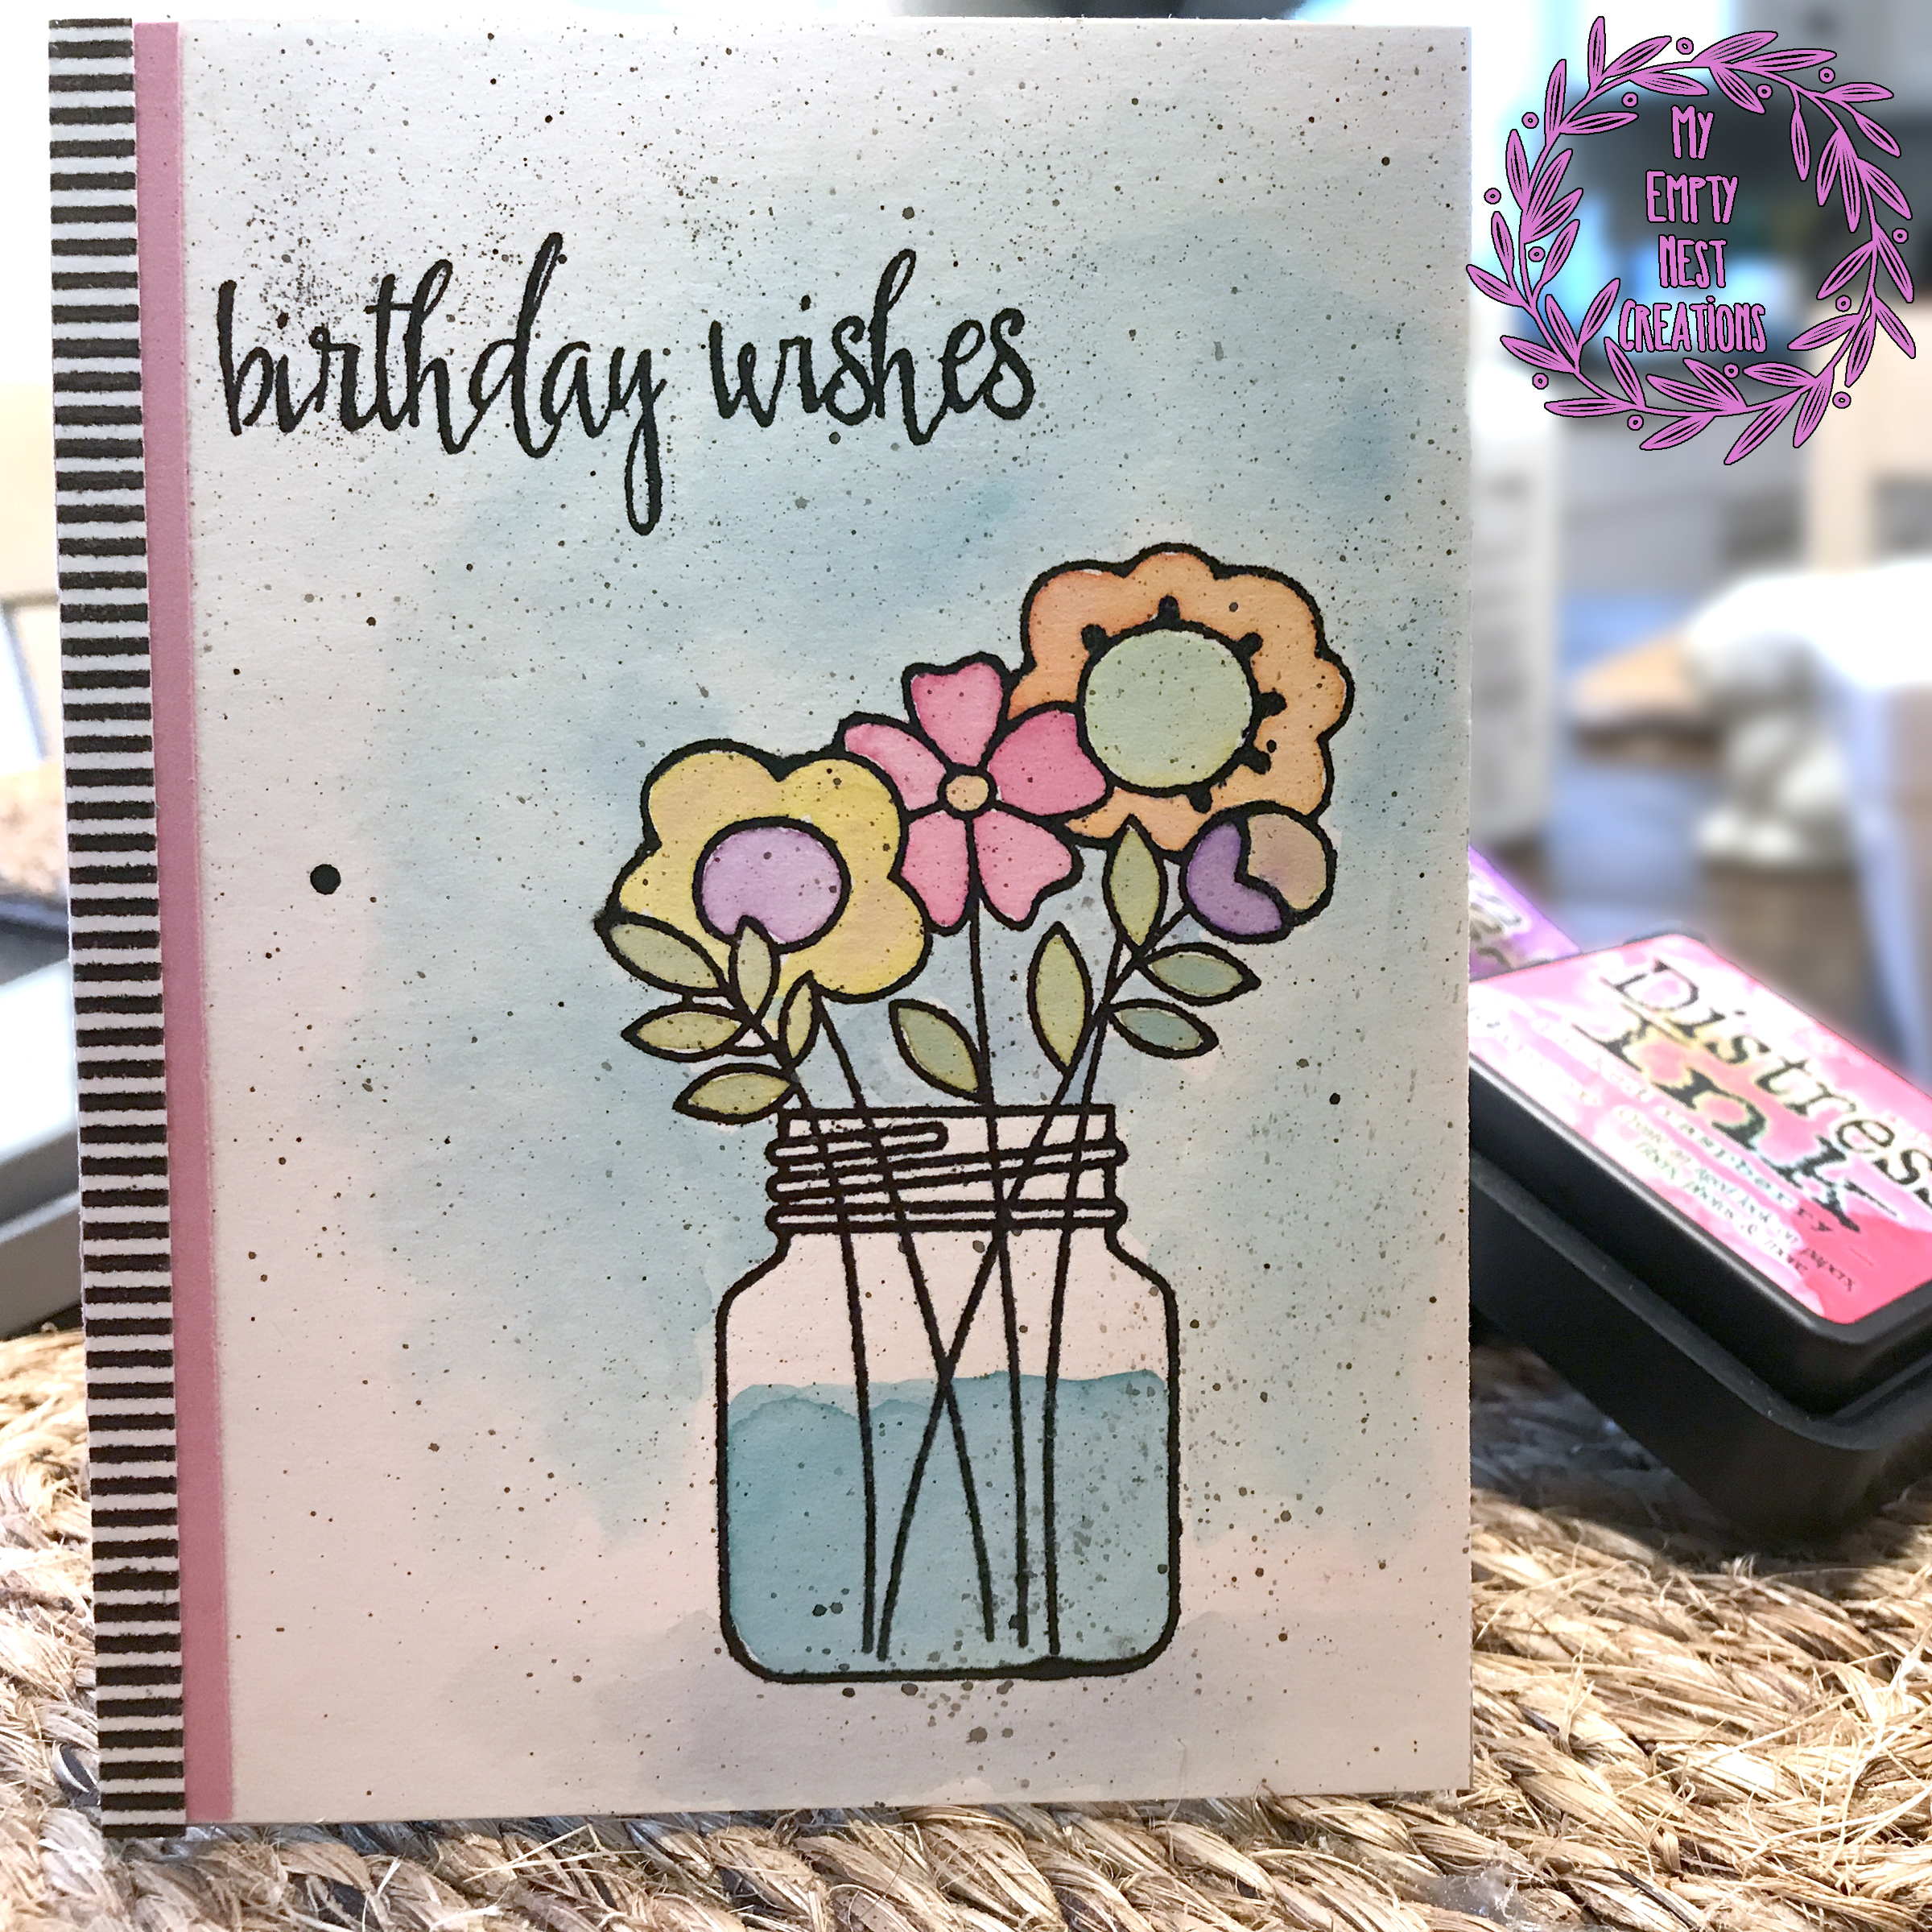 My Empty Nest Creations Paper Smooches Best Buds Birthday Card